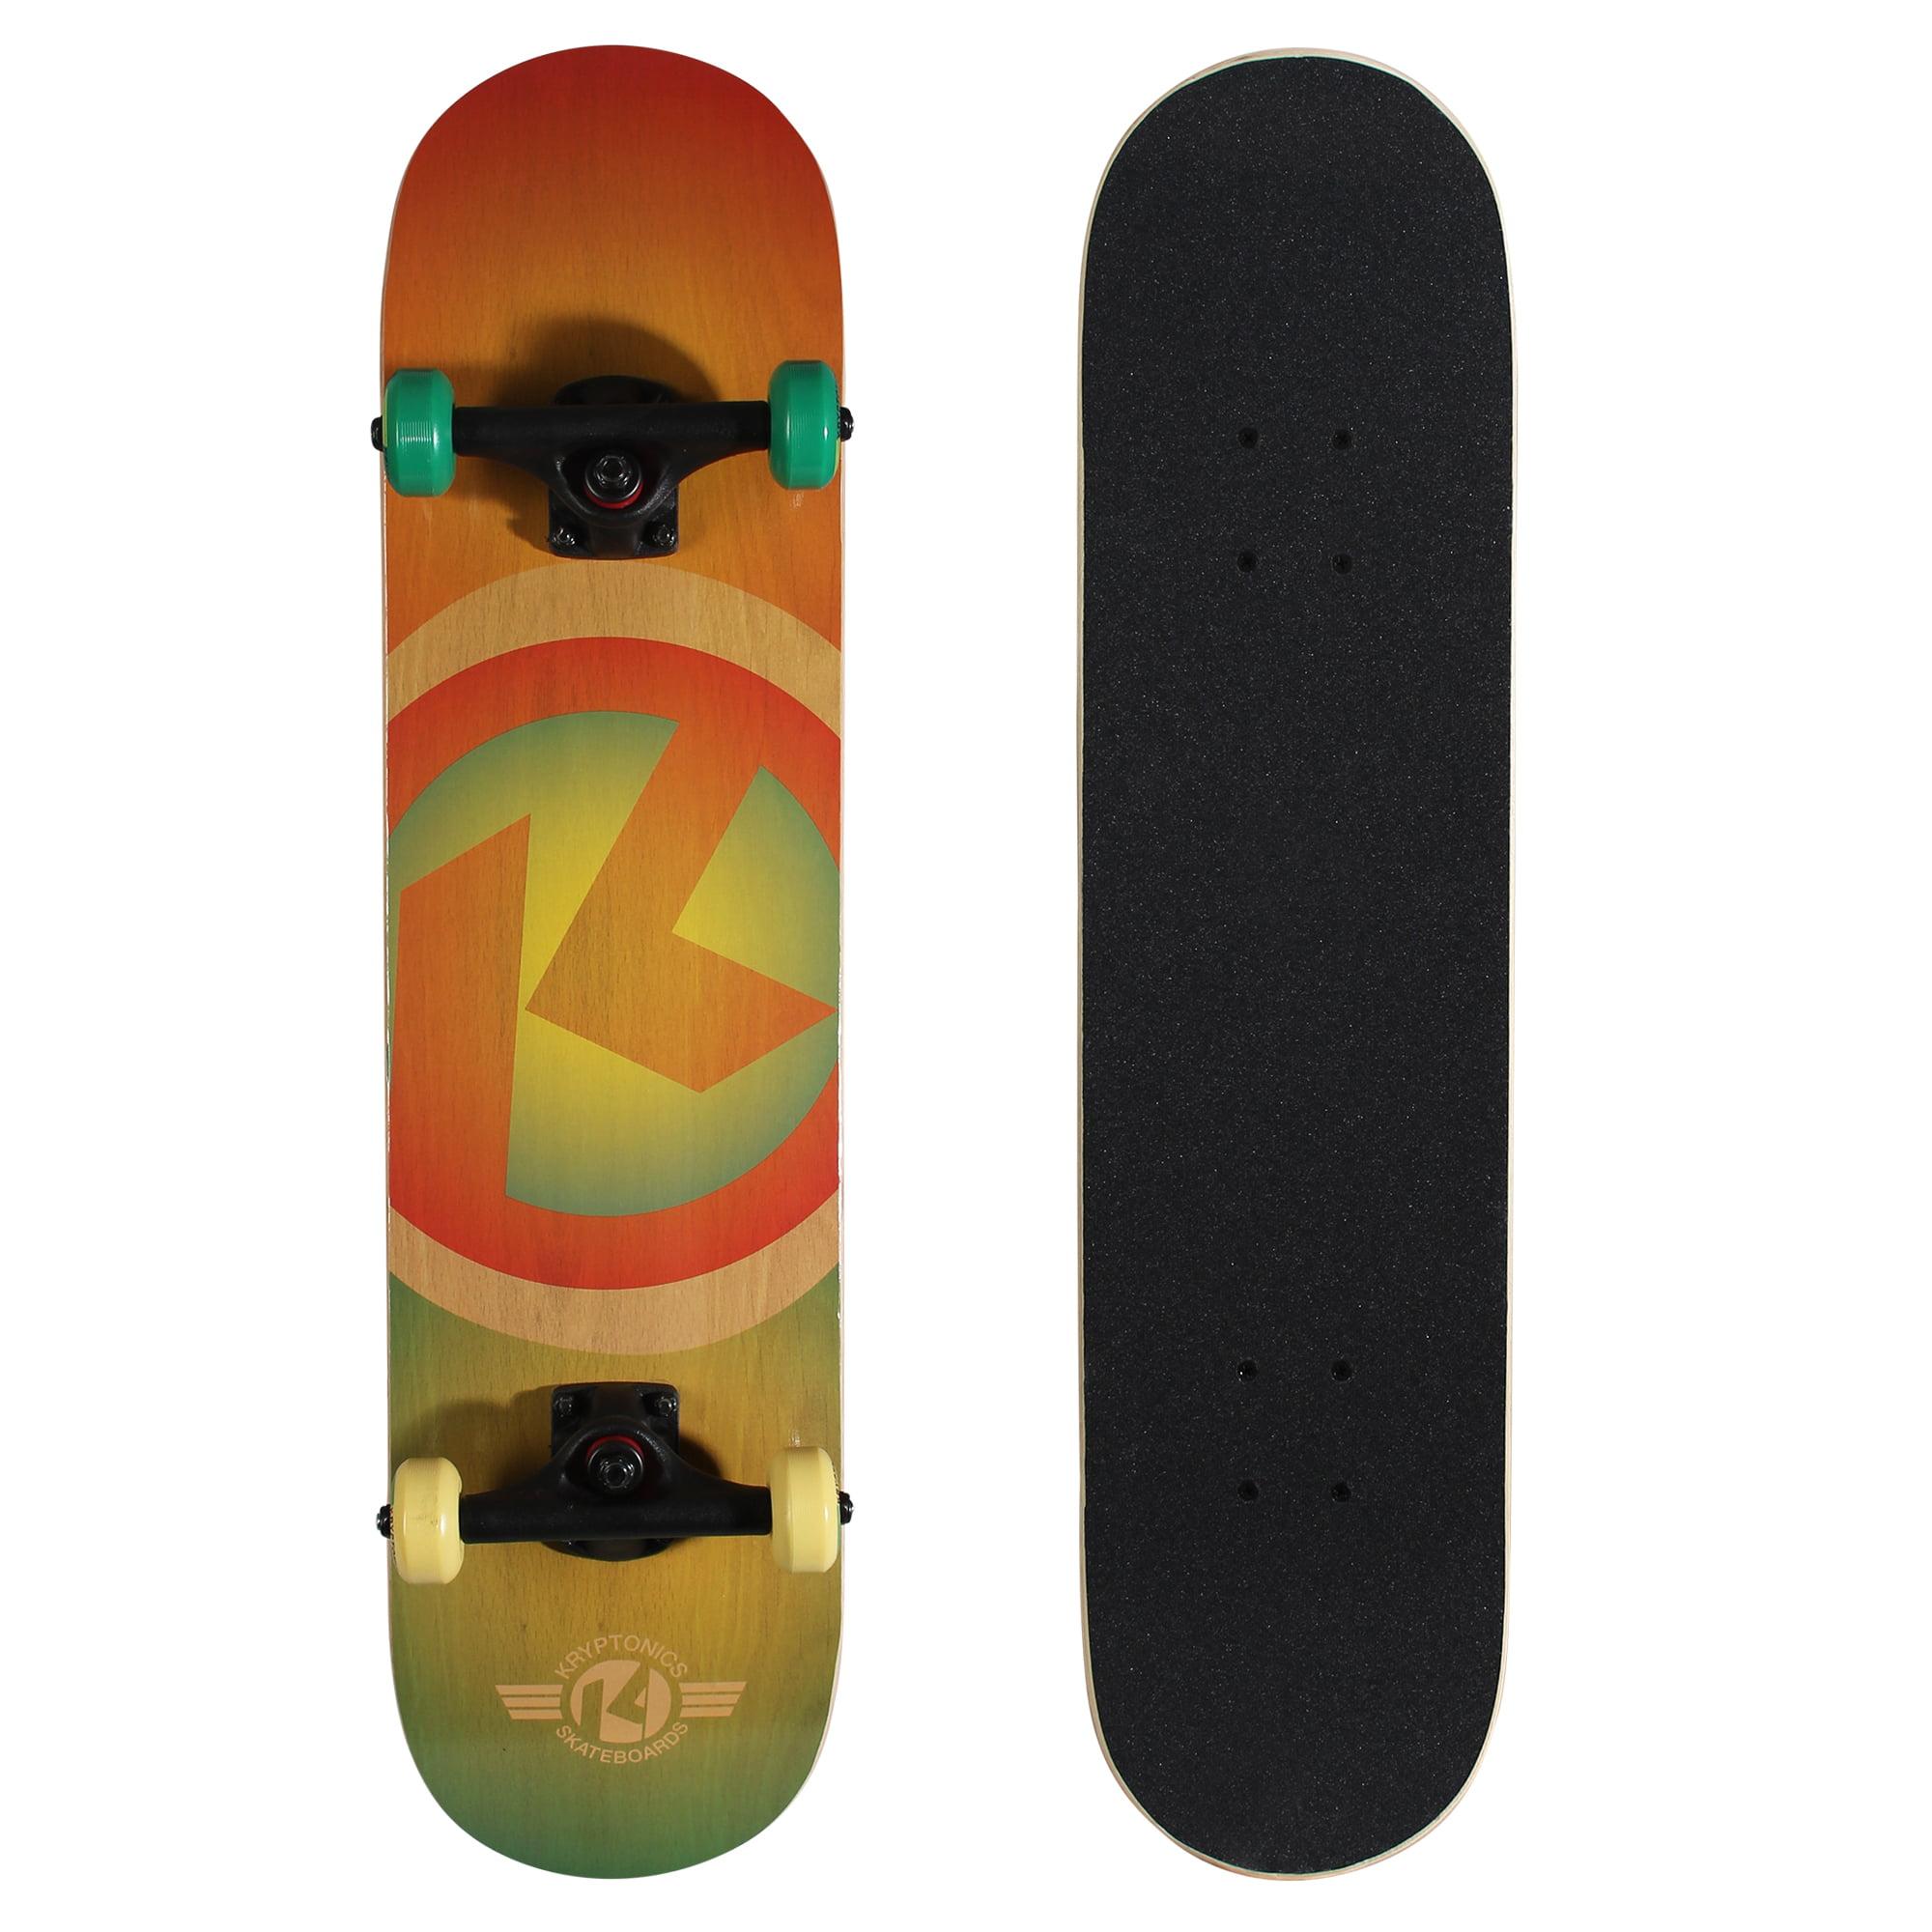 "Kryptonics Recruit Complete Skateboard (31"" x 7.5"")"